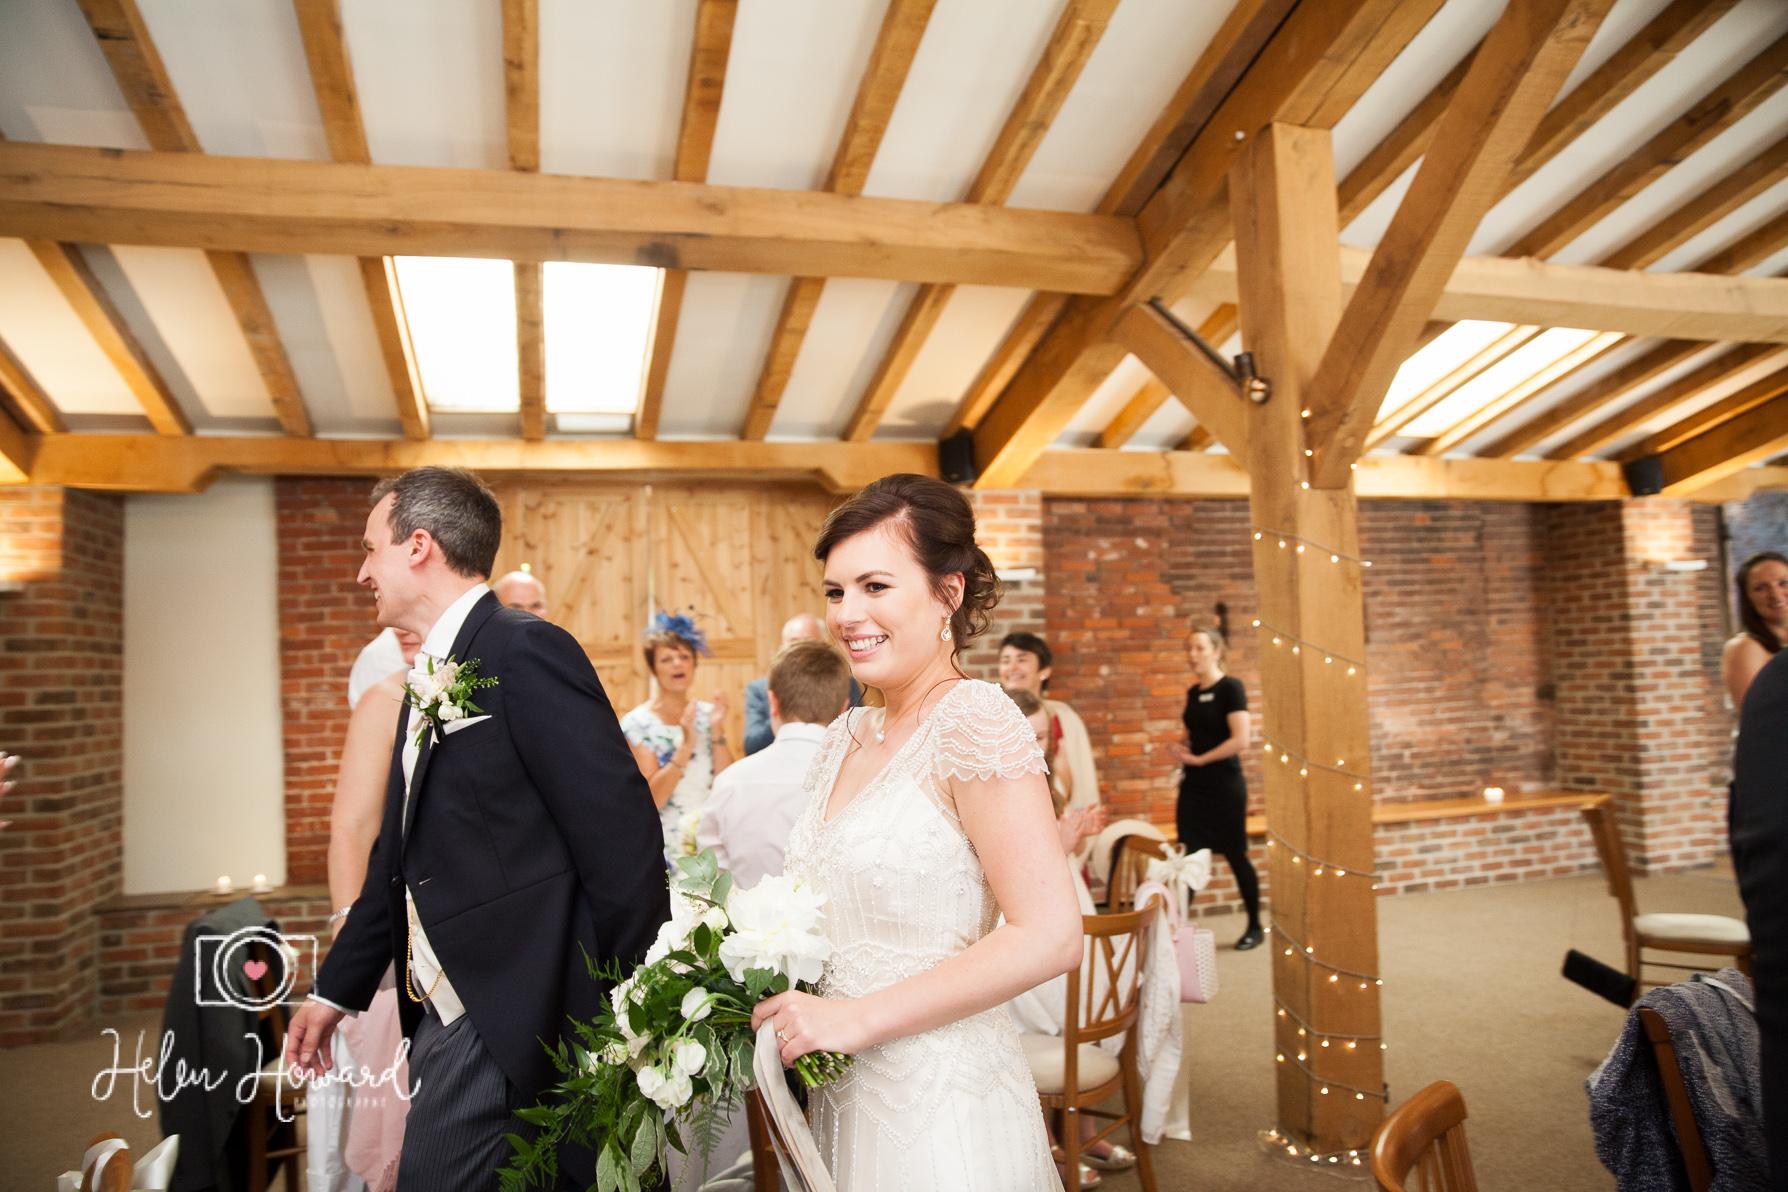 Helen Howard Photography Packington Moor Wedding-89.jpg